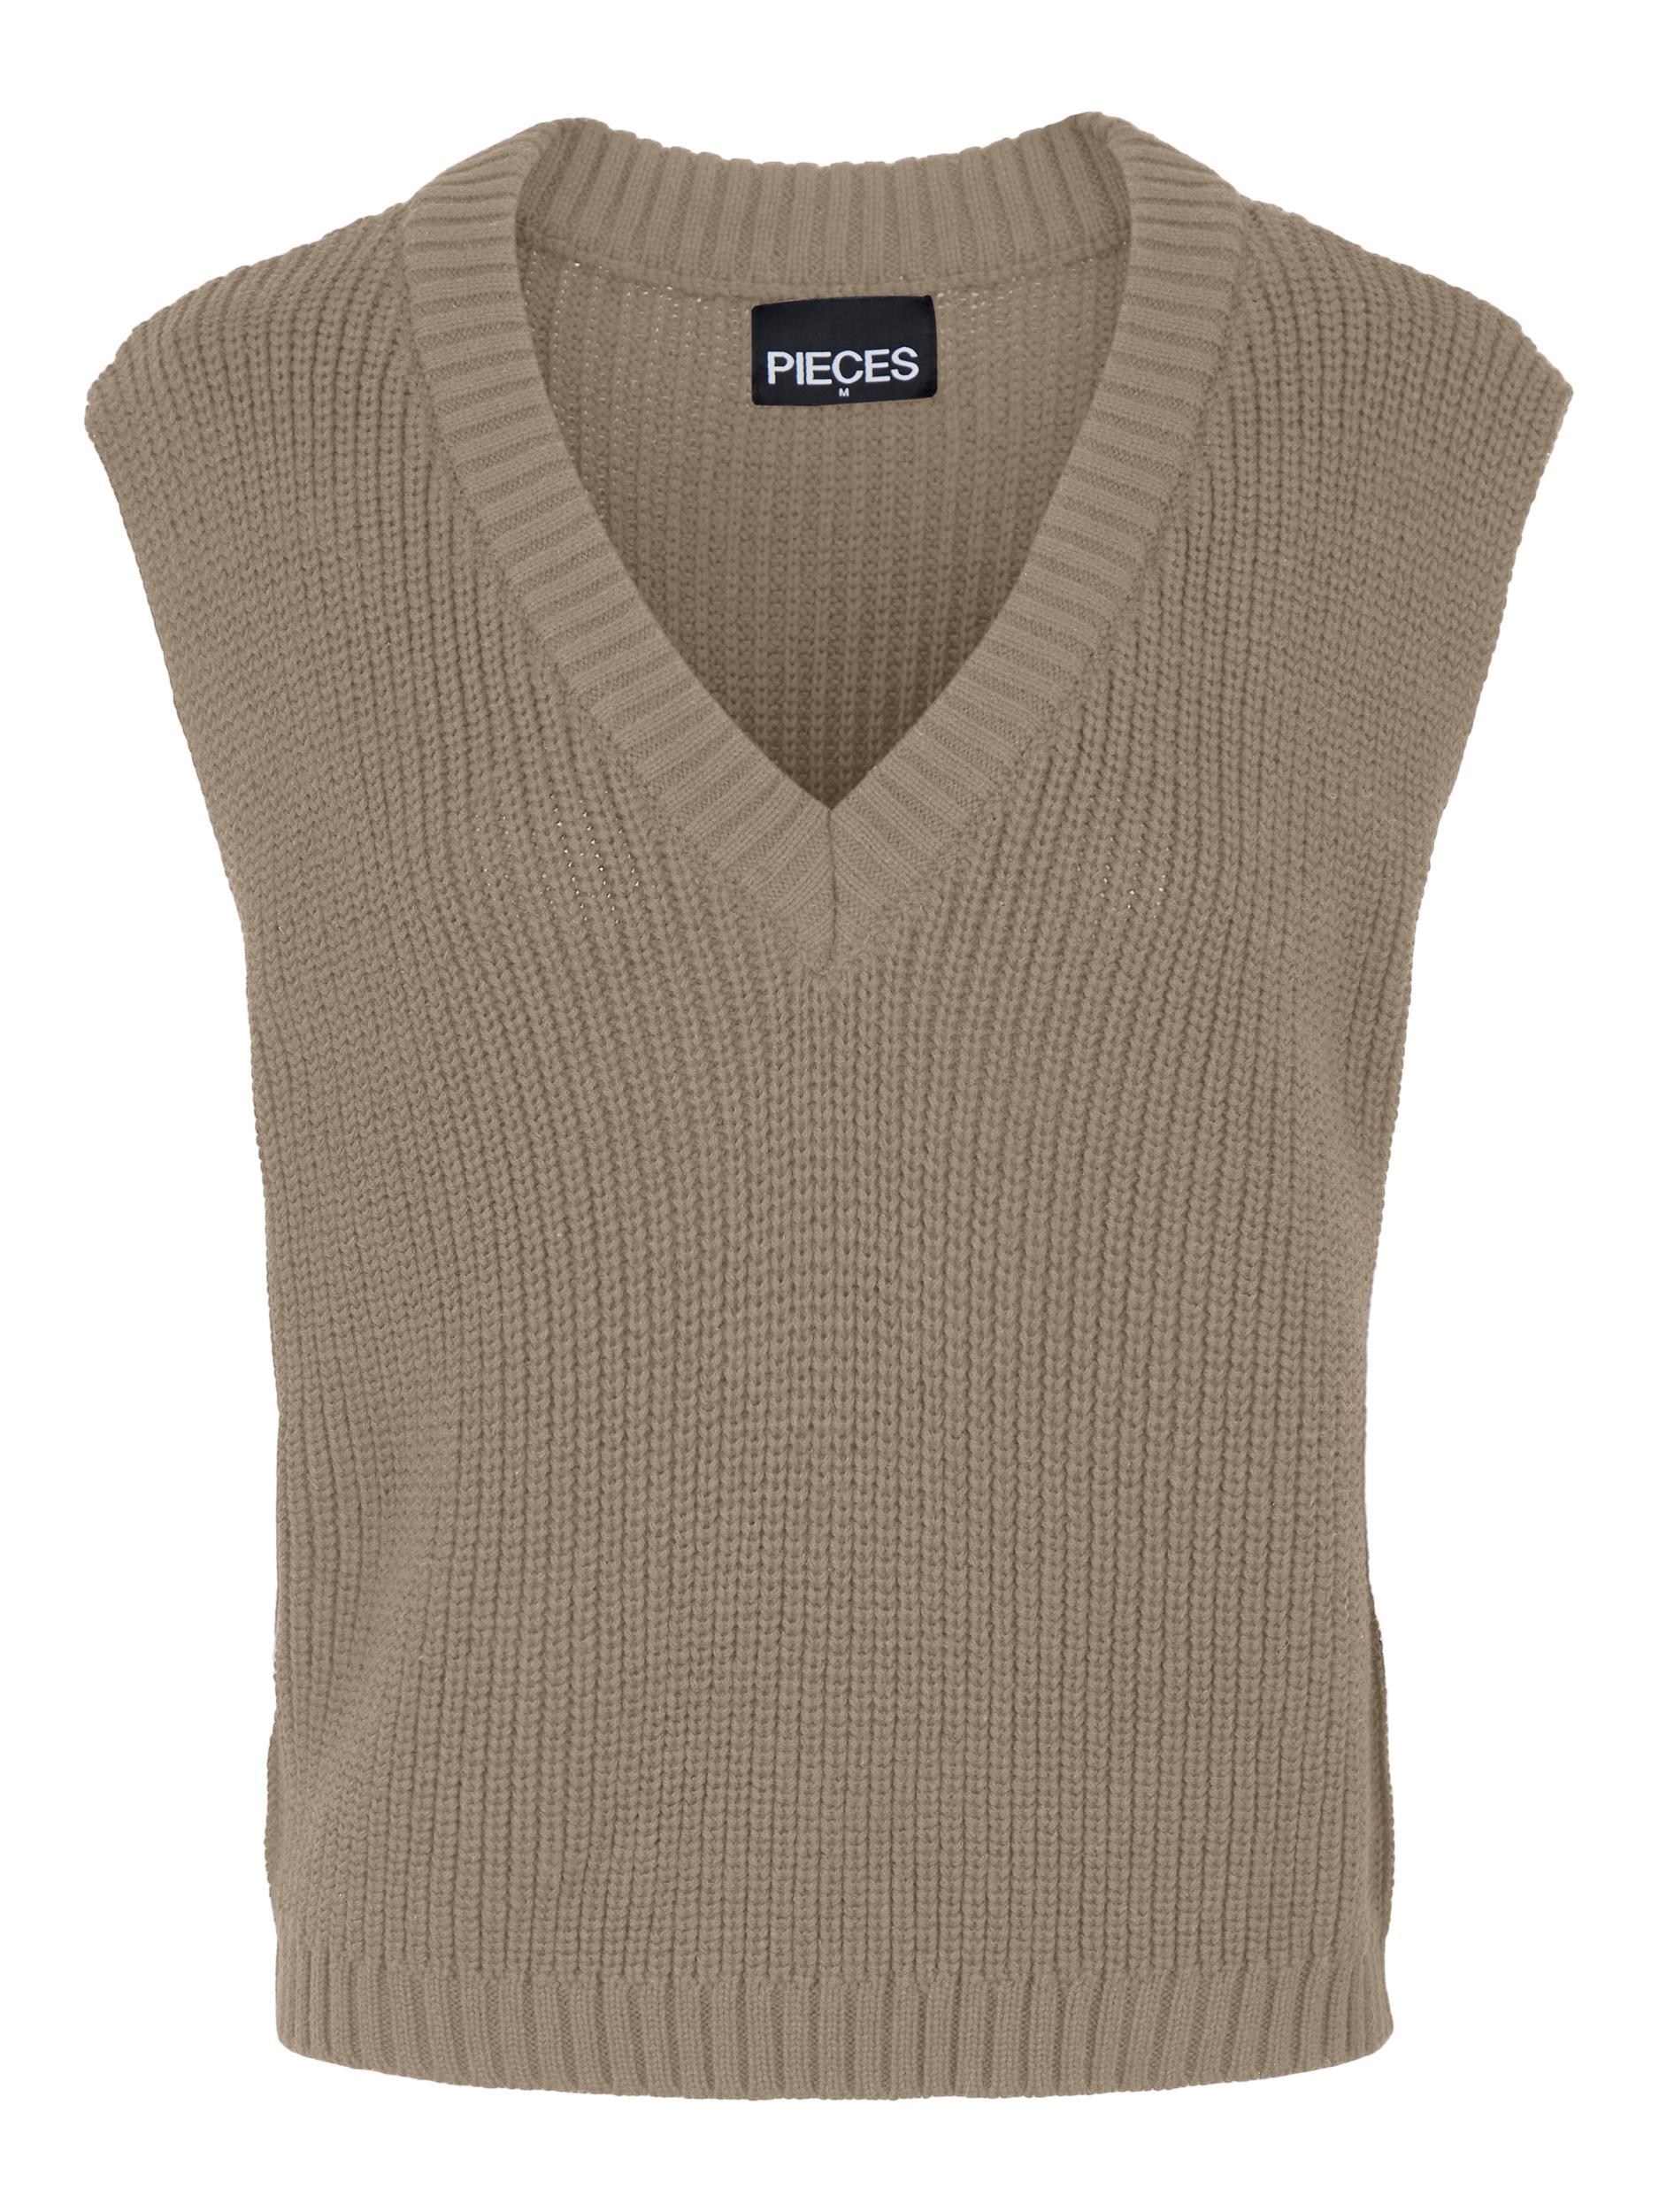 Pieces Carole V-Neck vest, silver mink, medium